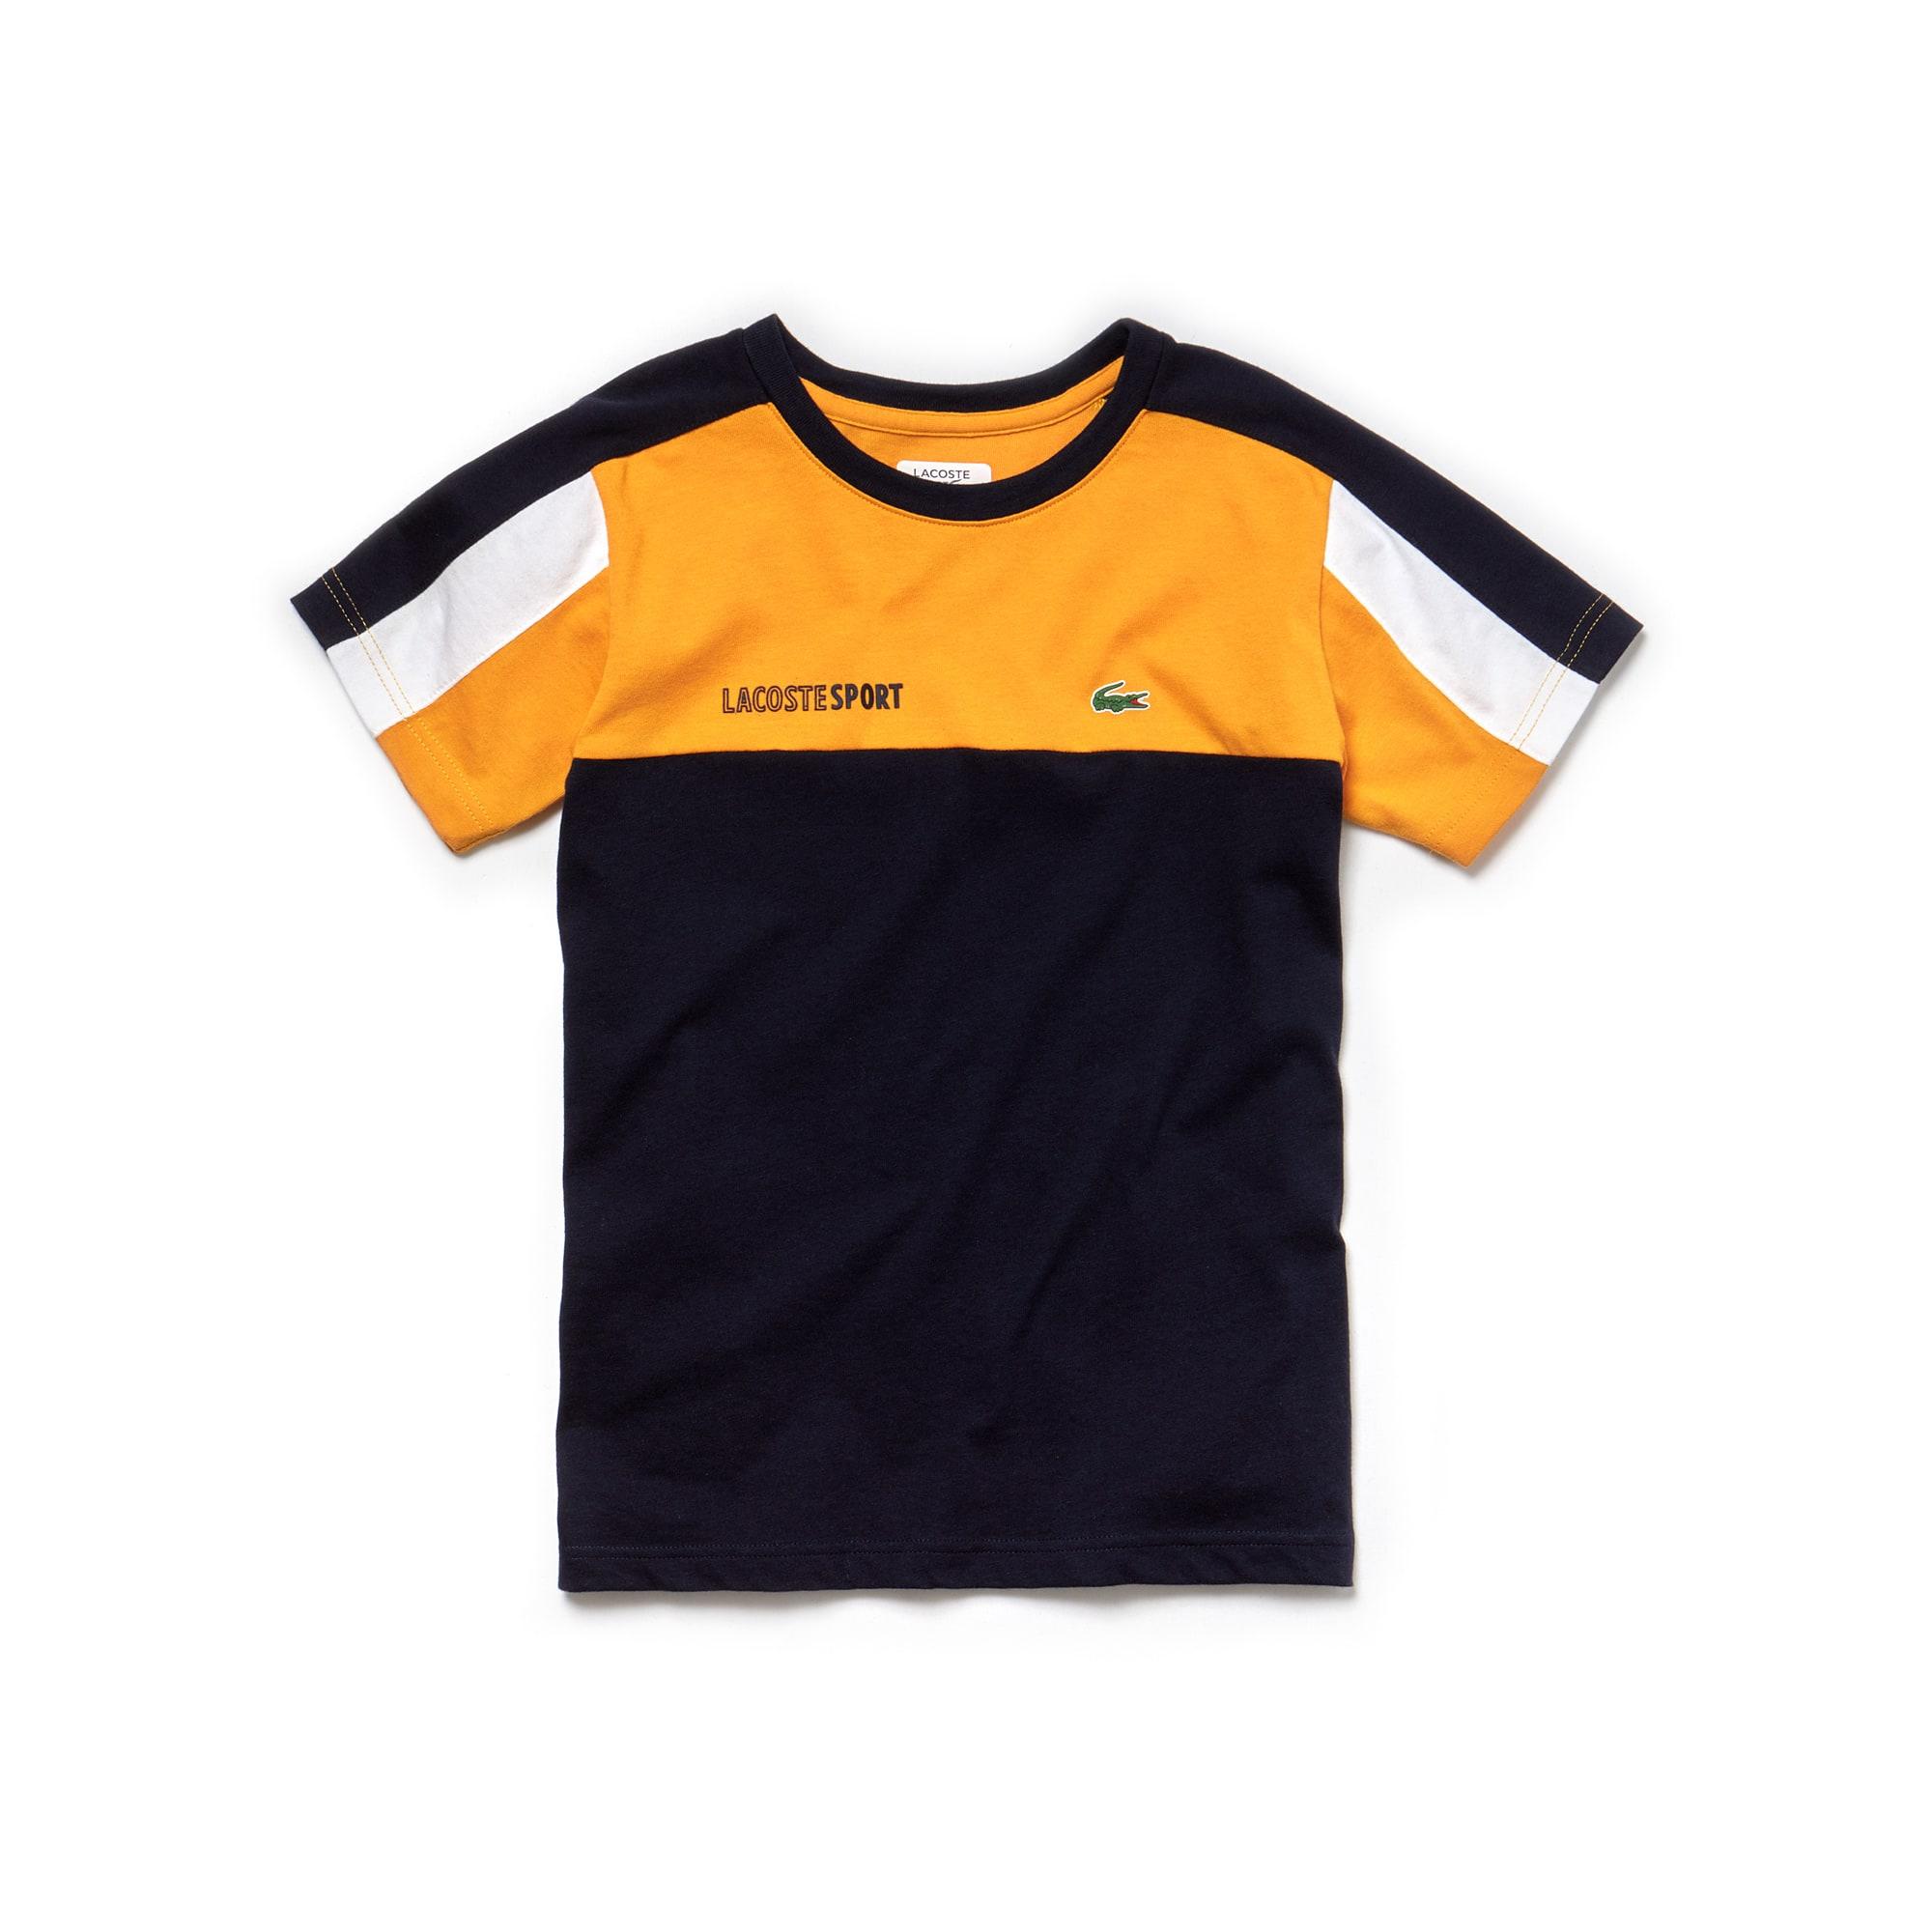 Jungen LACOSTE SPORT Tennis T-Shirt aus Jersey mit Colorblocks